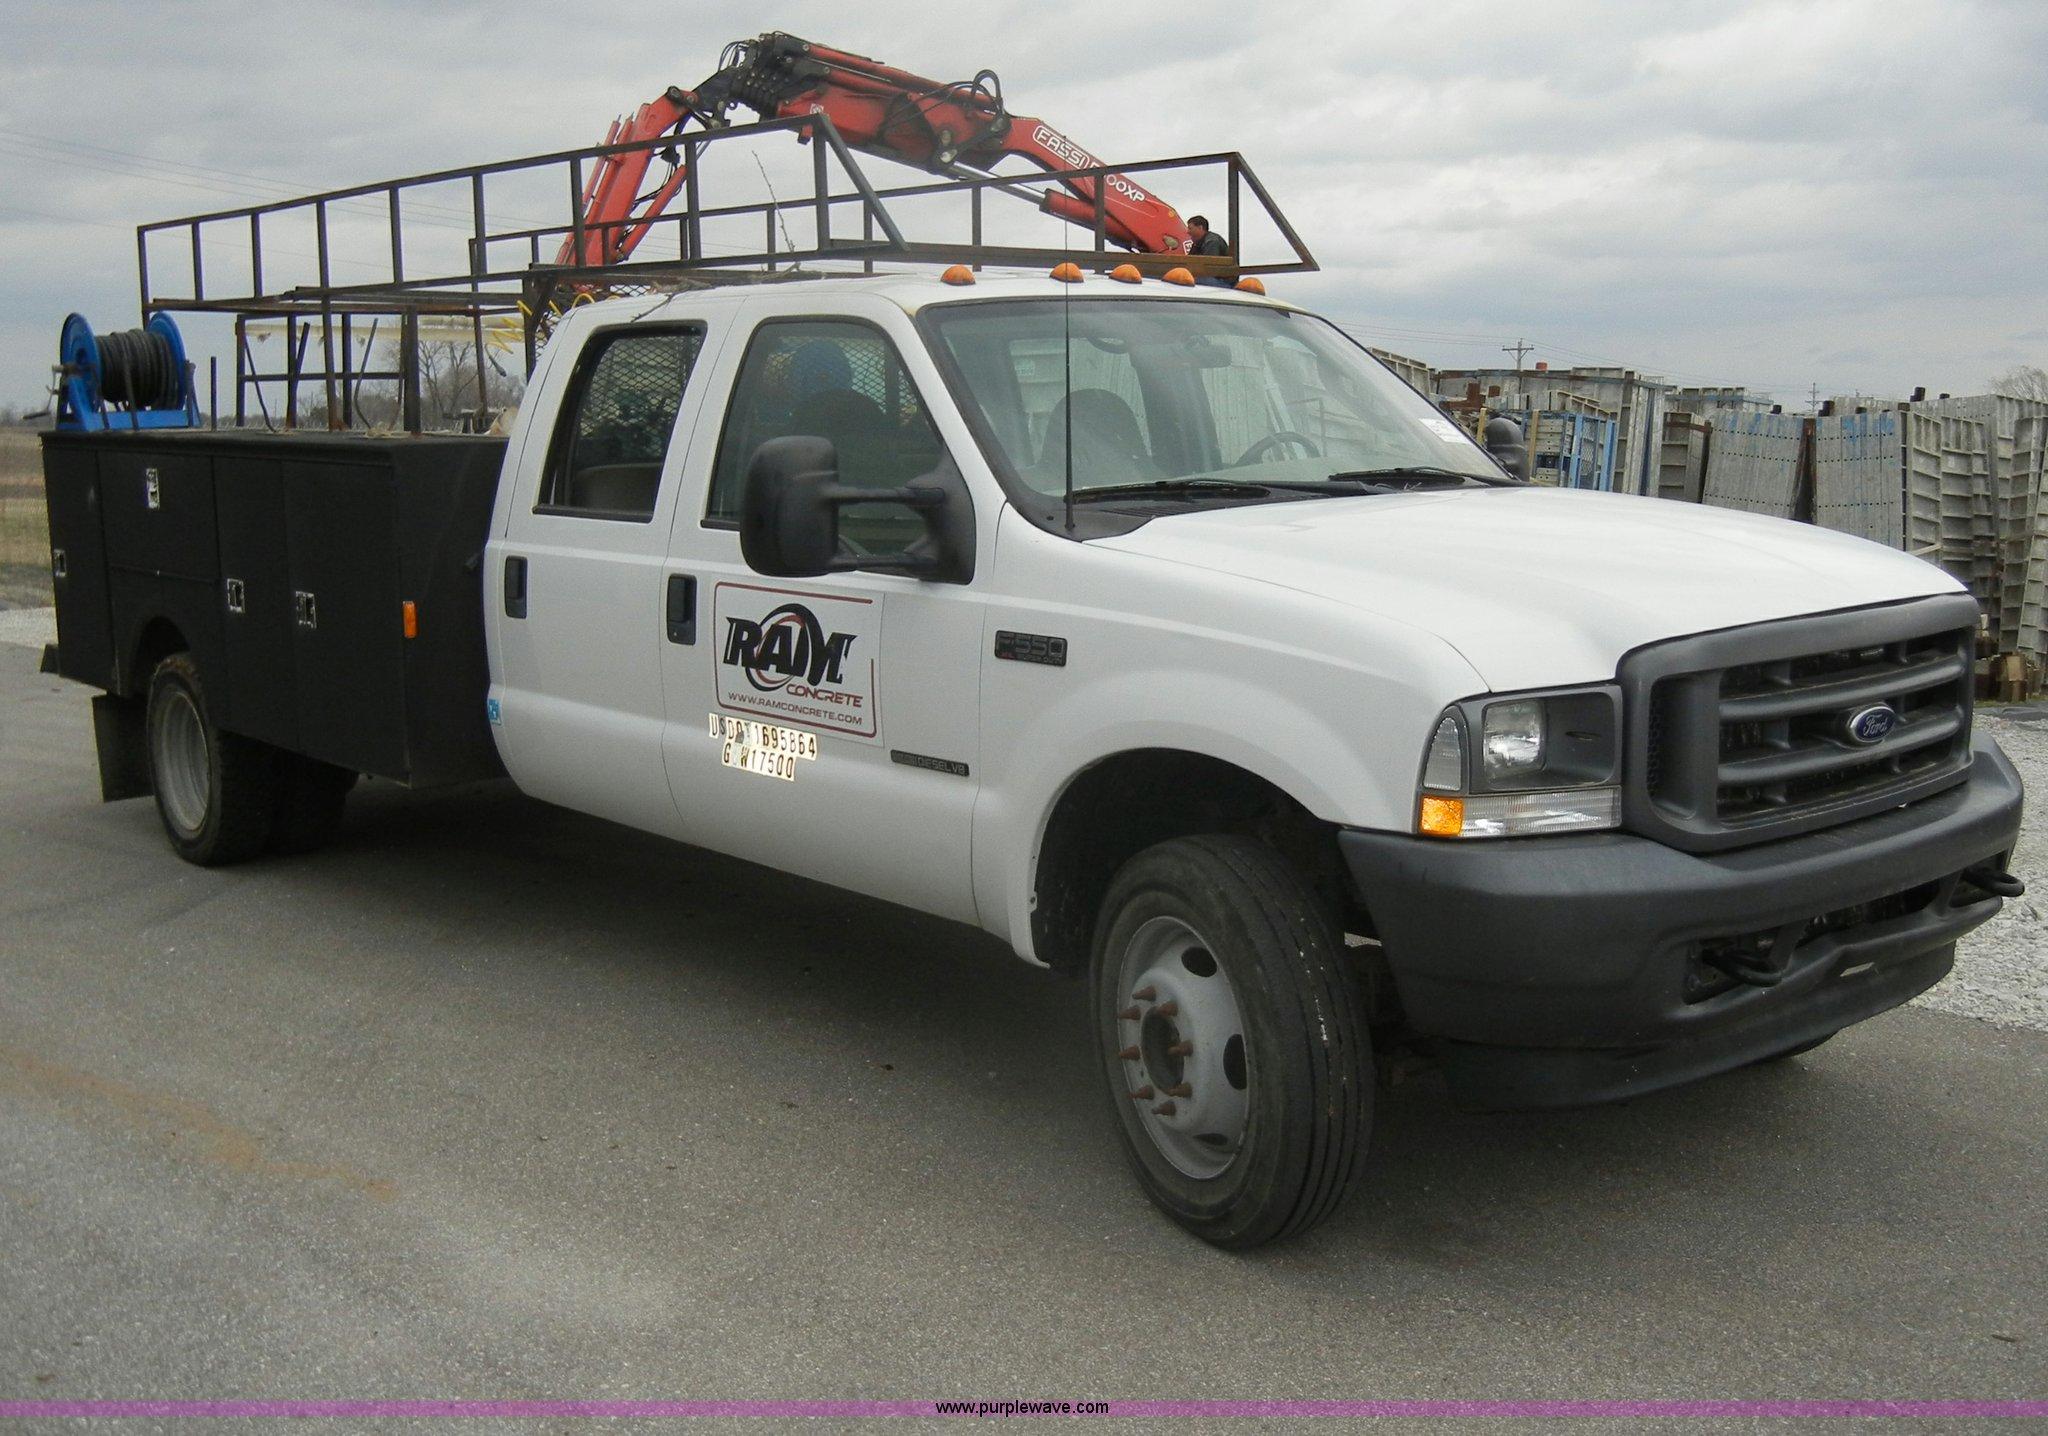 2003 Ford F550 Super Duty Wiring Diagrams Fuse Box Xl Crew Cab Pickup Truck Item C4 Rh Purplewave Com Specs Panel Diagram